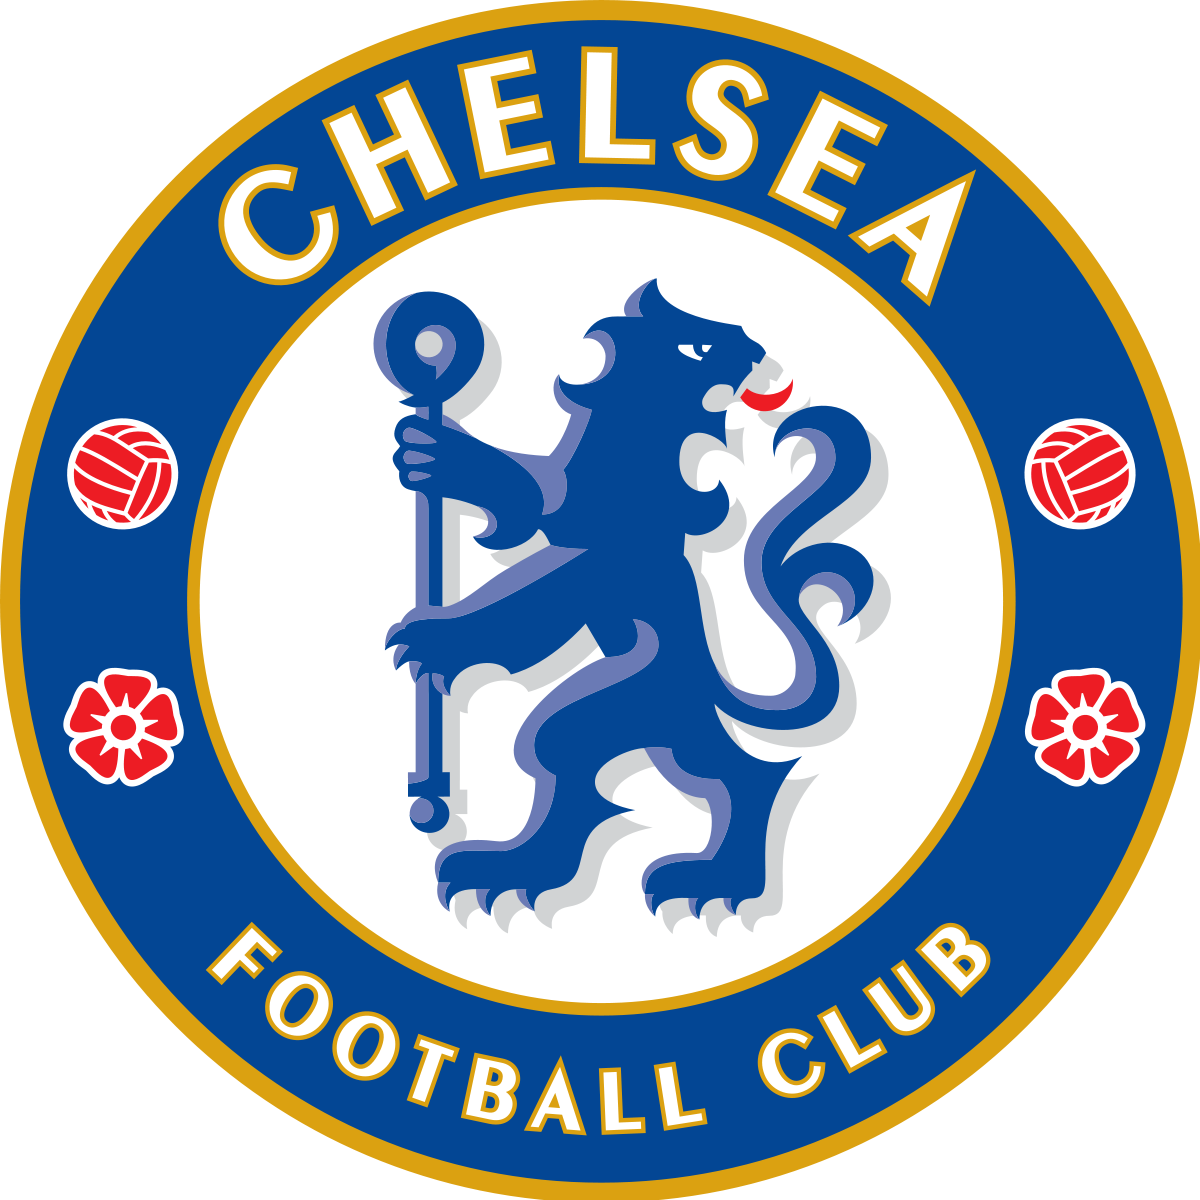 Chelsea U-21 logo